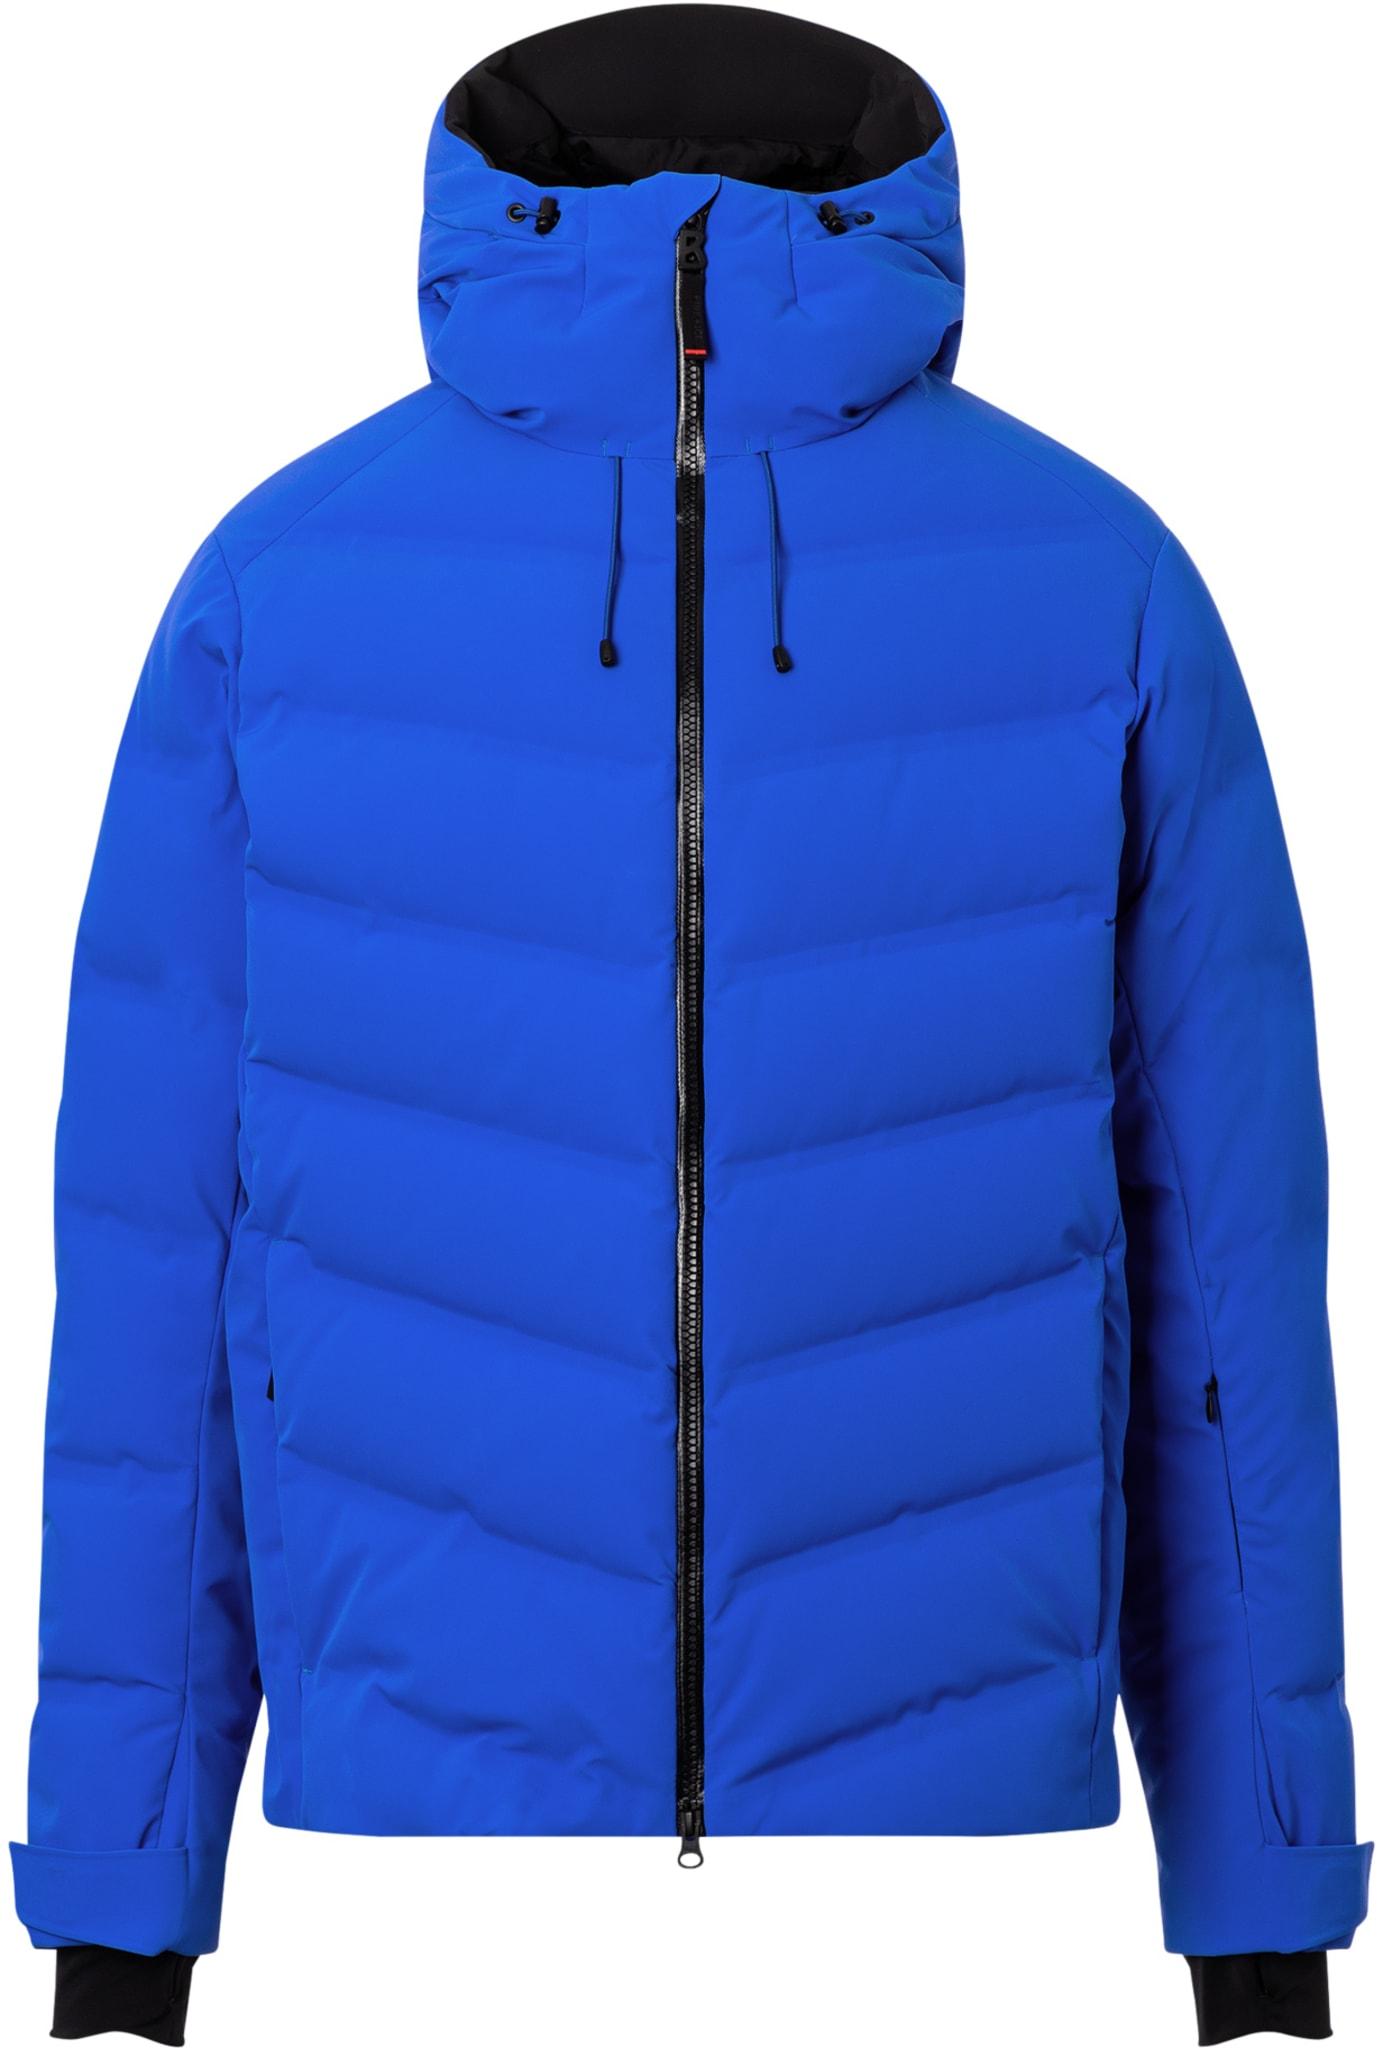 Remo Ski Jacket